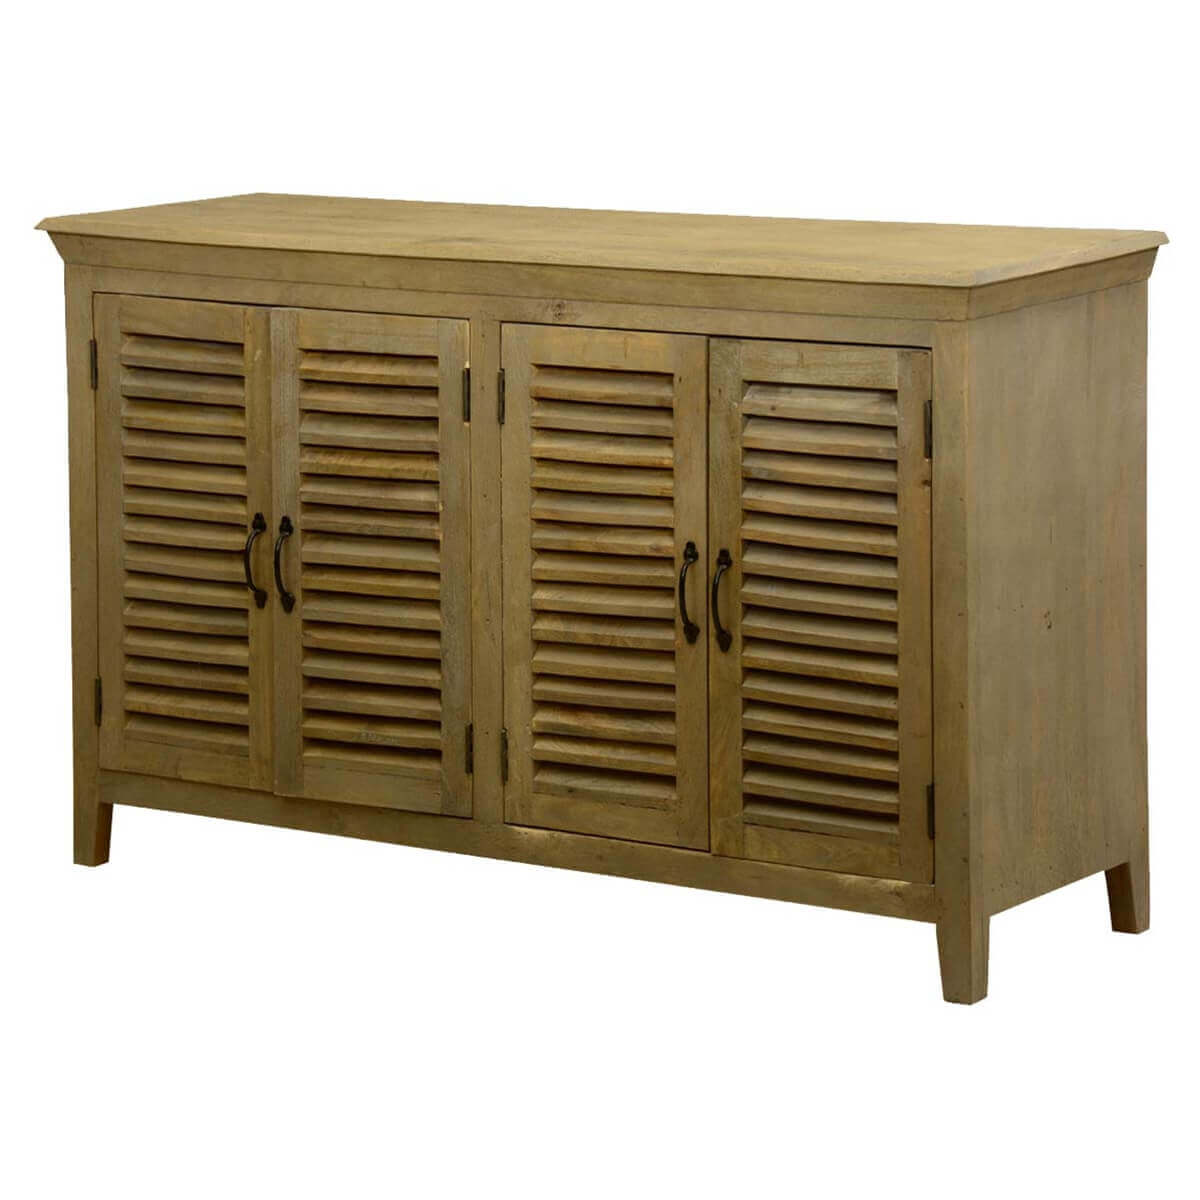 Oklahoma Honey Mango Wood Shutter Door Buffet Cabinet